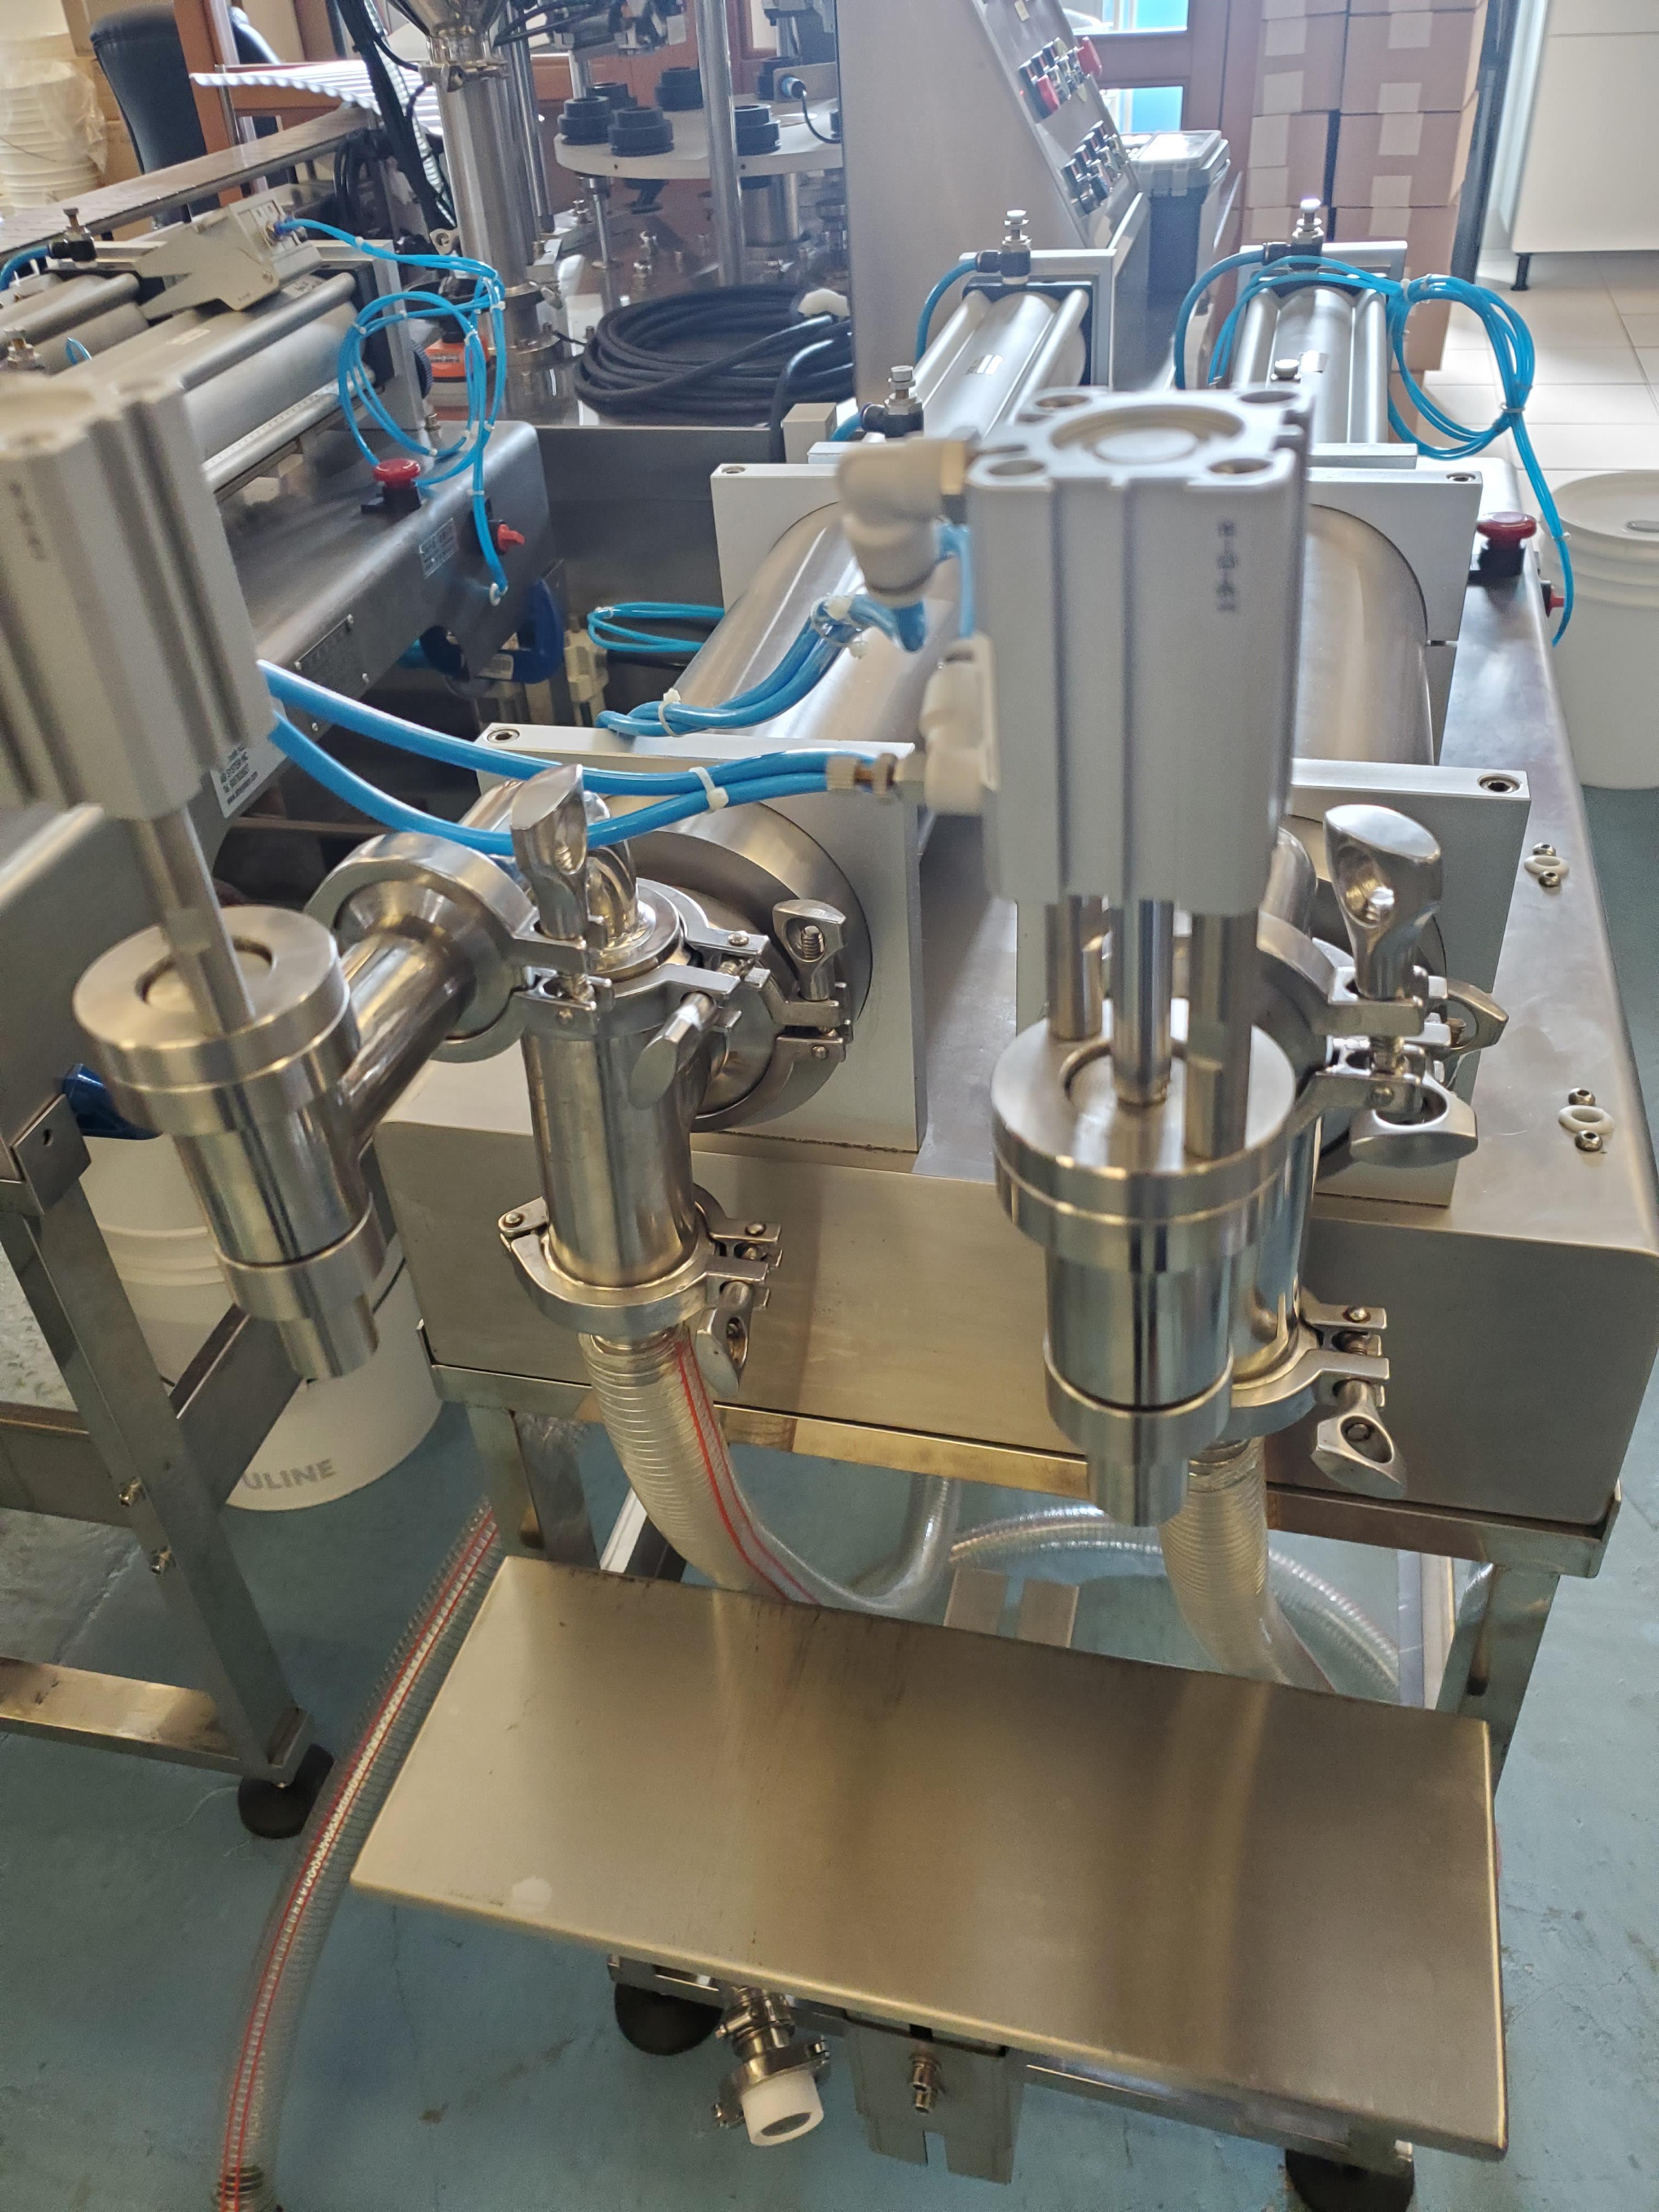 Double Piston Liquid Filler - All Stainless Steel Construction